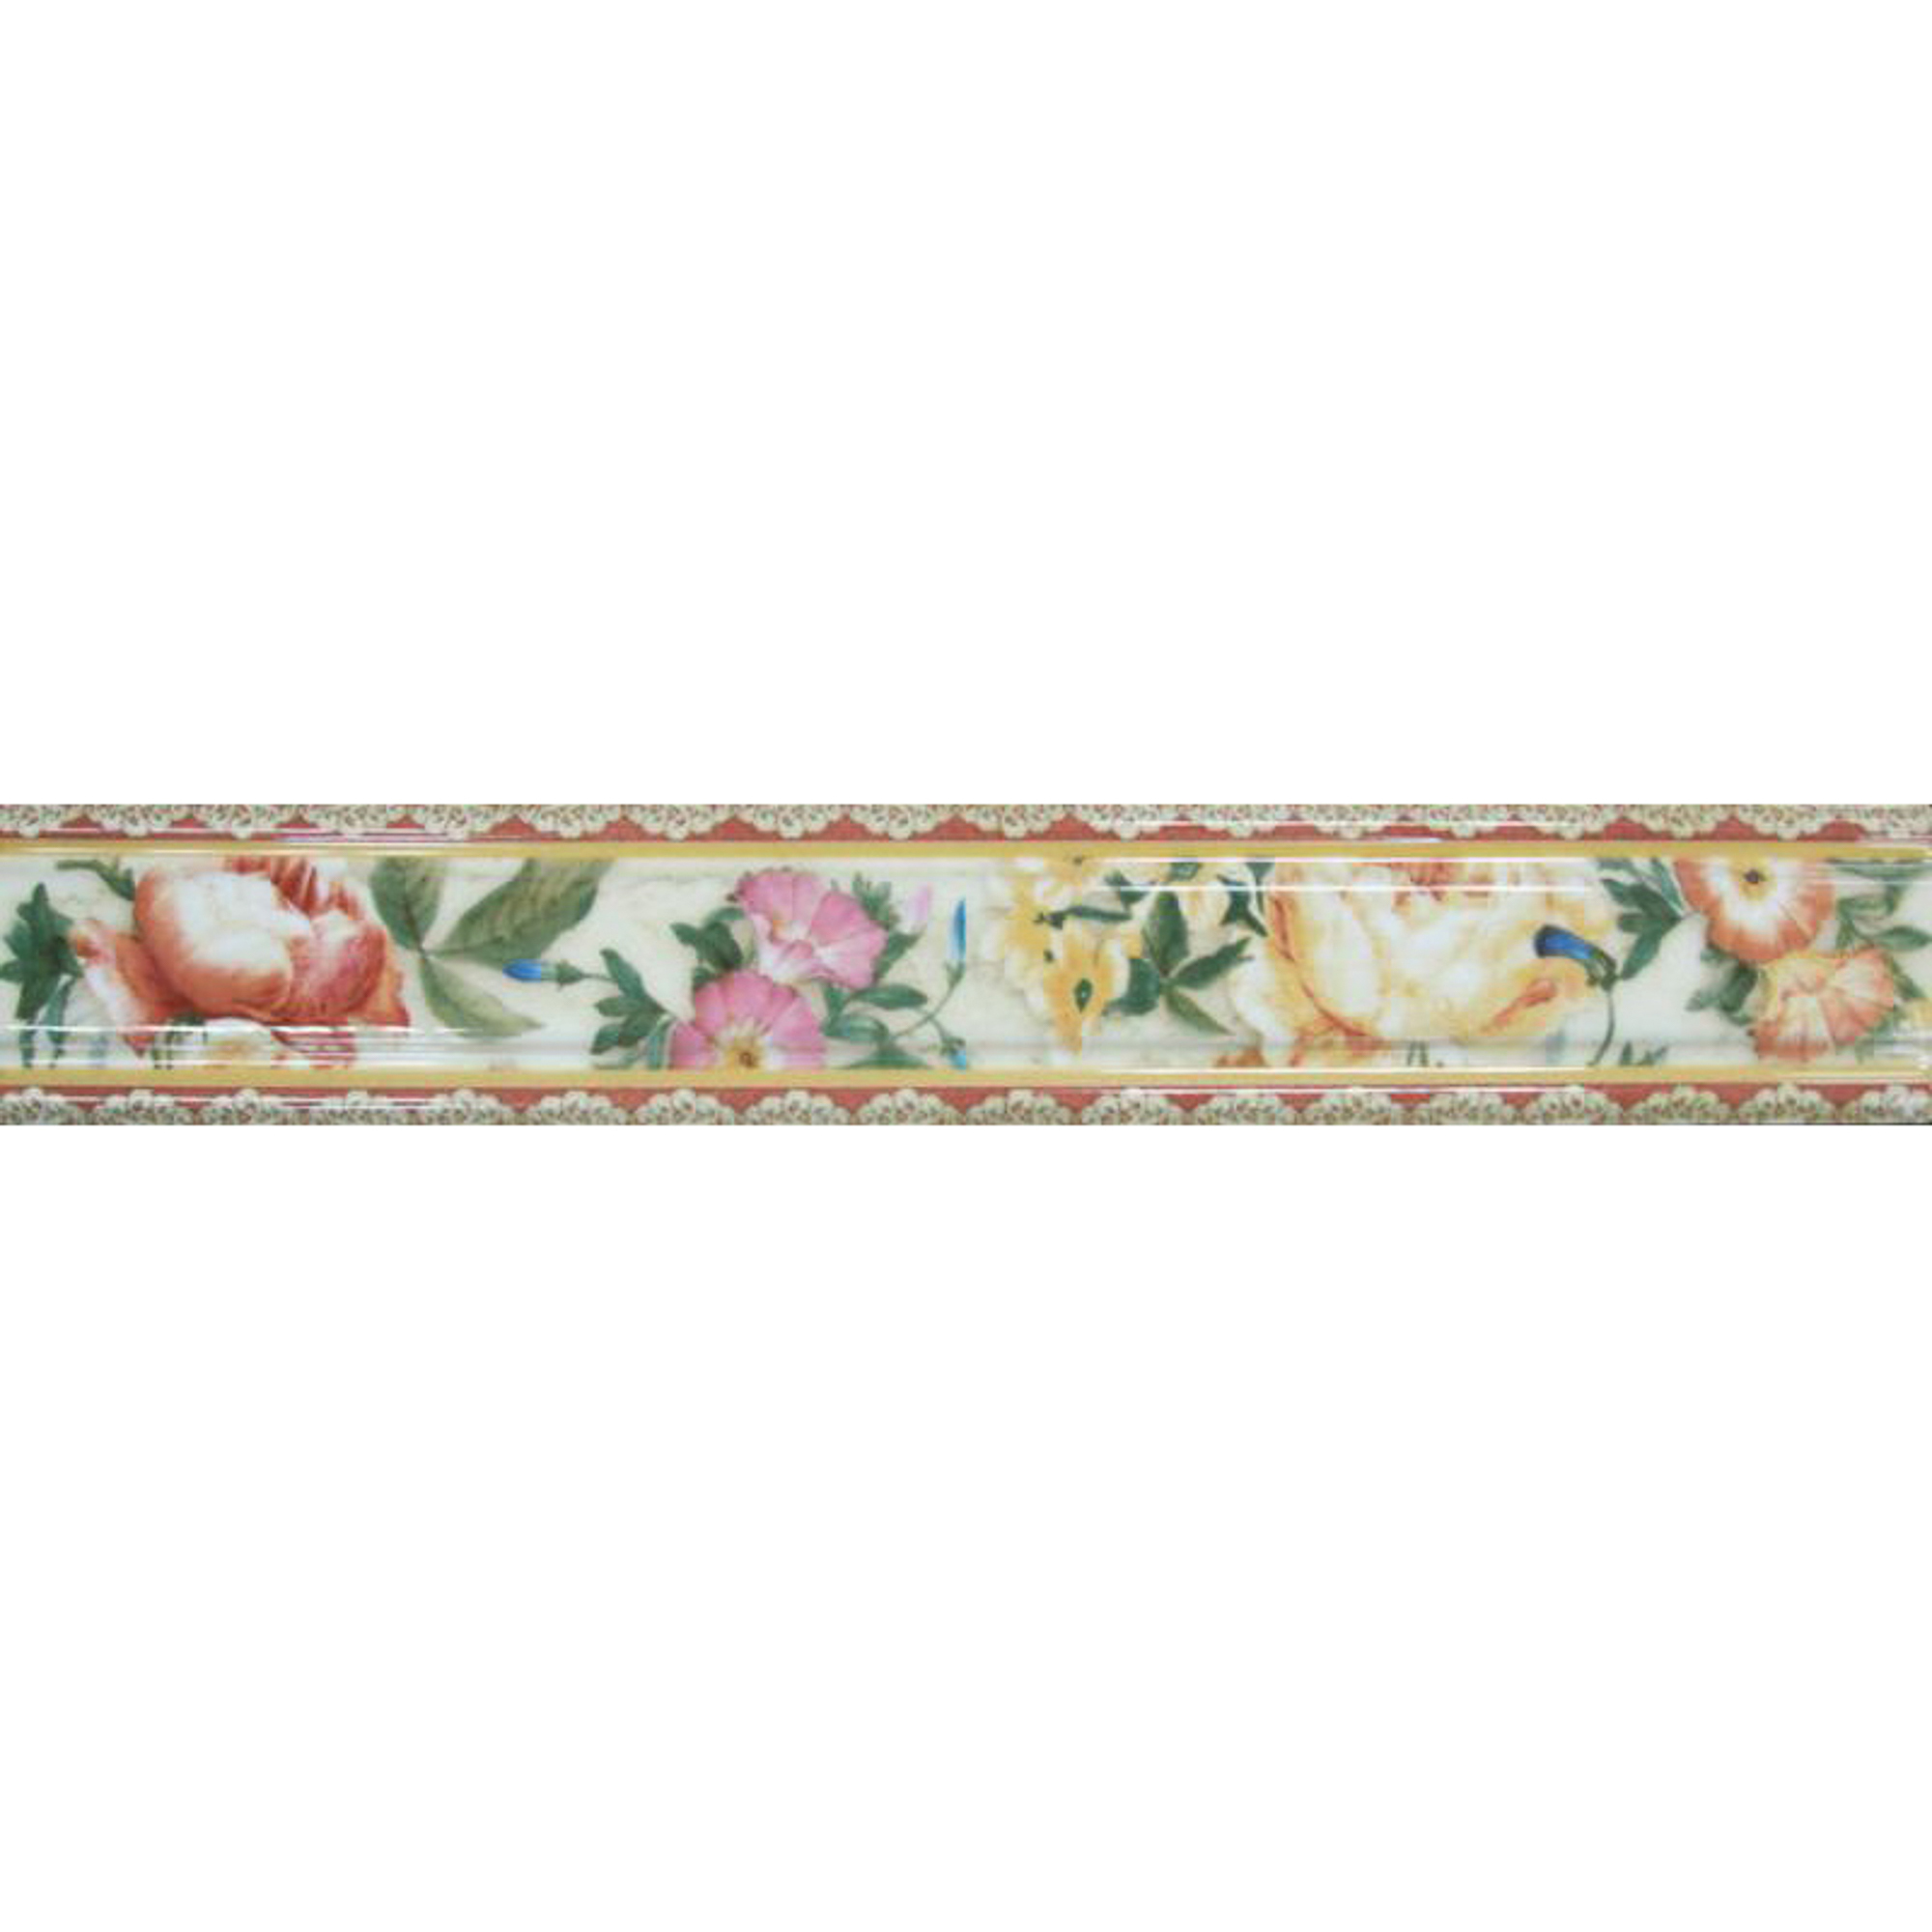 Бордюр Mainzu Ceramica Meknes Cenefa Crema 5x30 см PT01359